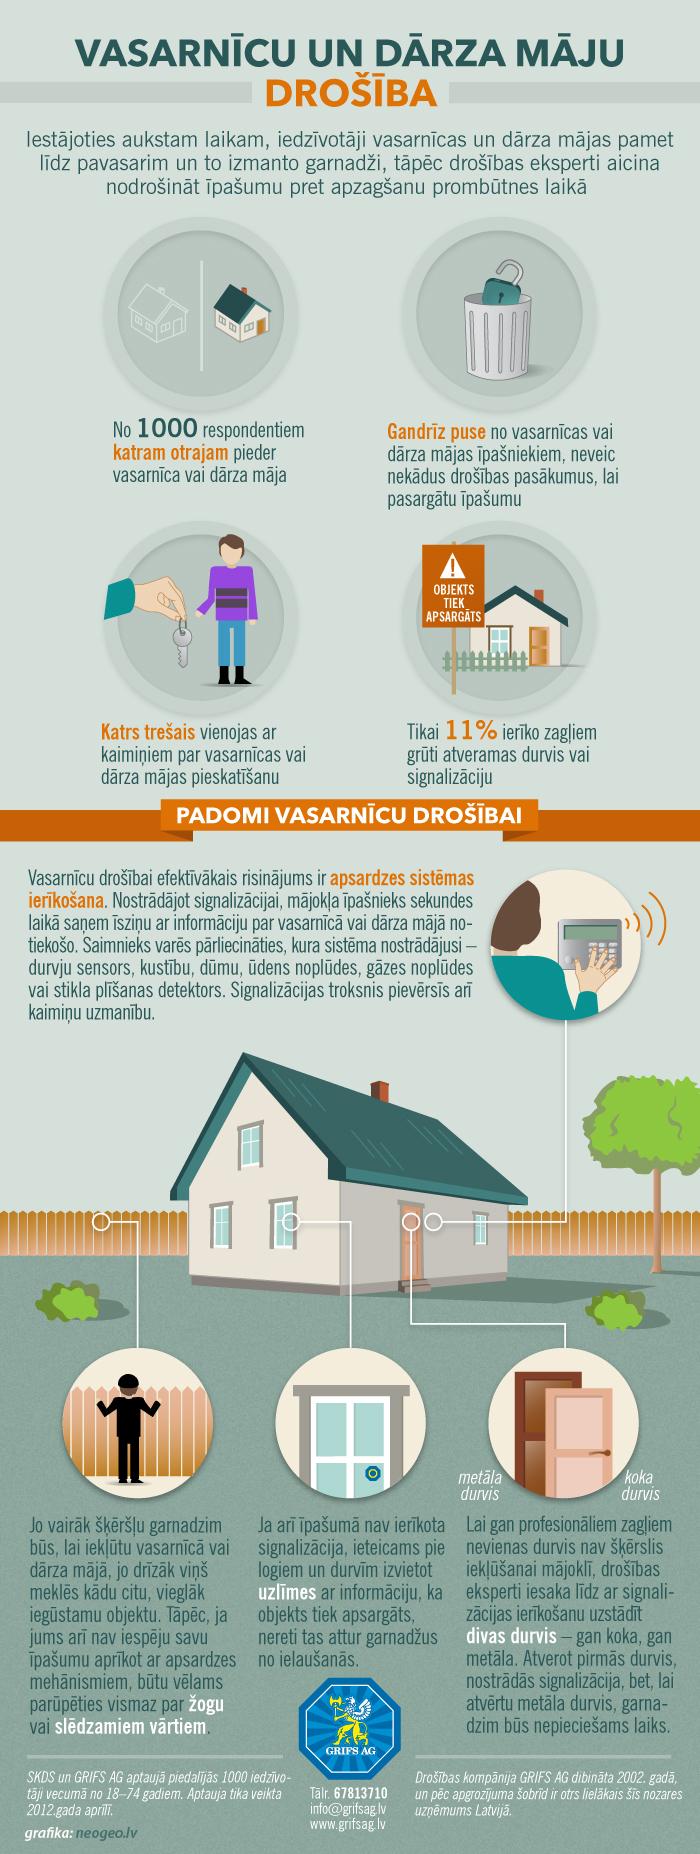 Infografika: Vasarnīcu un dārza māju drosība